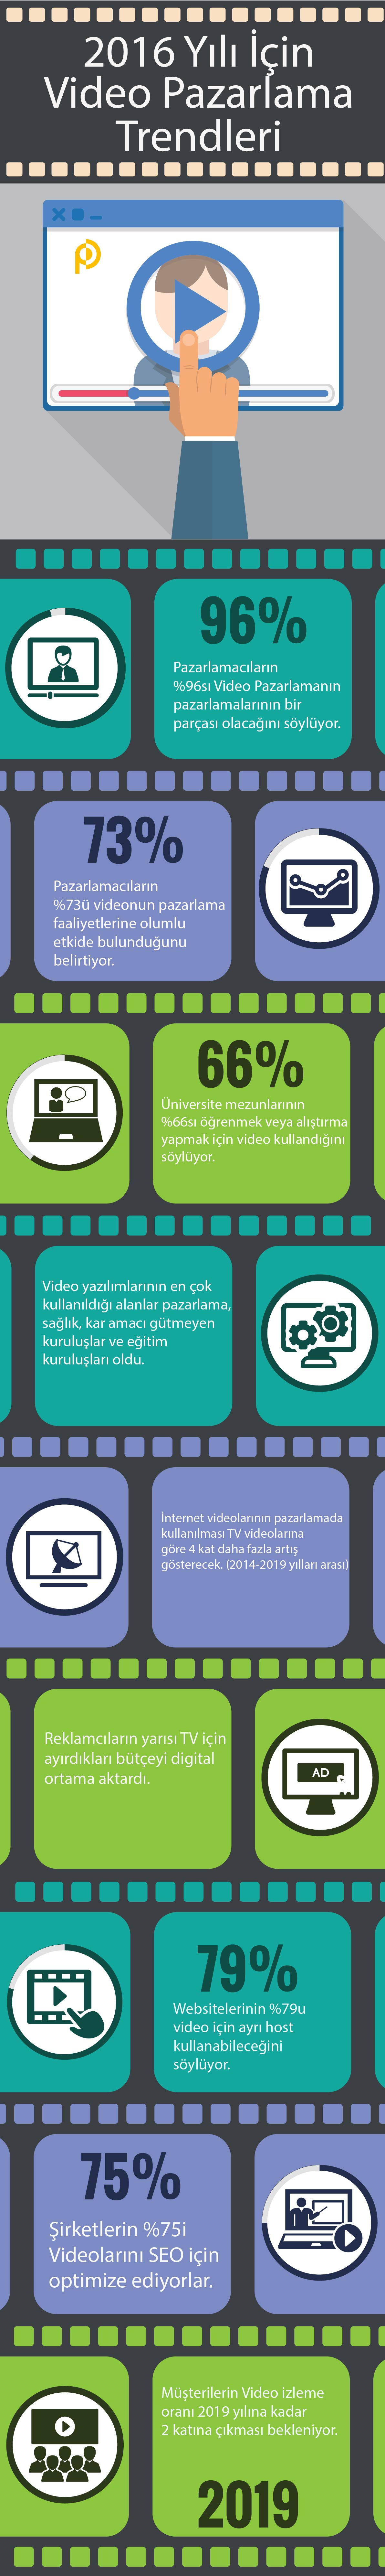 video-pazarlama-trendleri